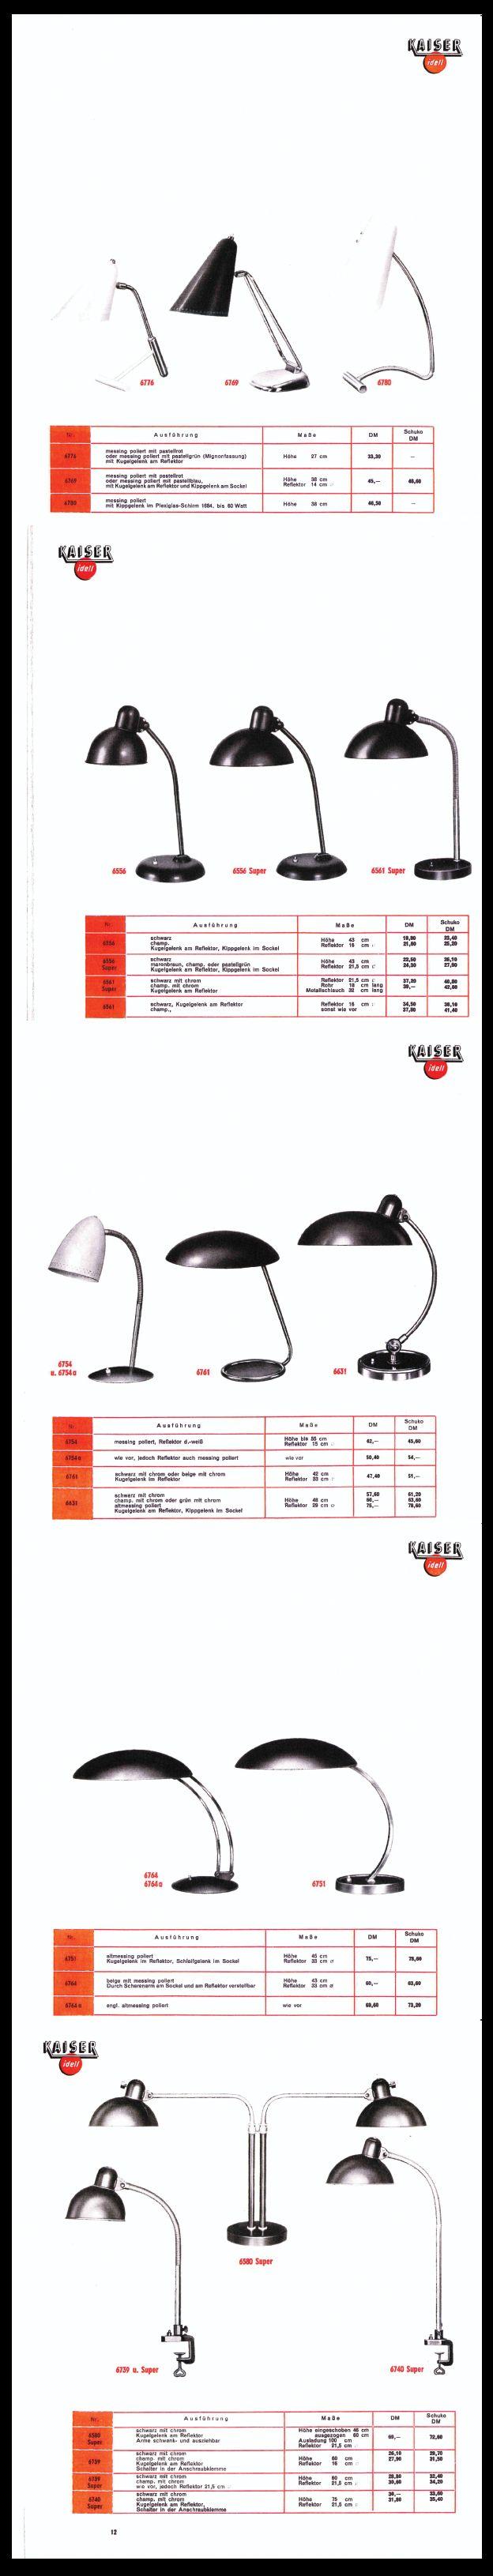 Rare Kaiser & Co. Work Lamp Catalogue 1955 - #KaiserIdell #Kaiser_Idell #ChristianDell #Bauhaus #Modernism #Modernist #Molecula #arbeitslampen #werkstatte